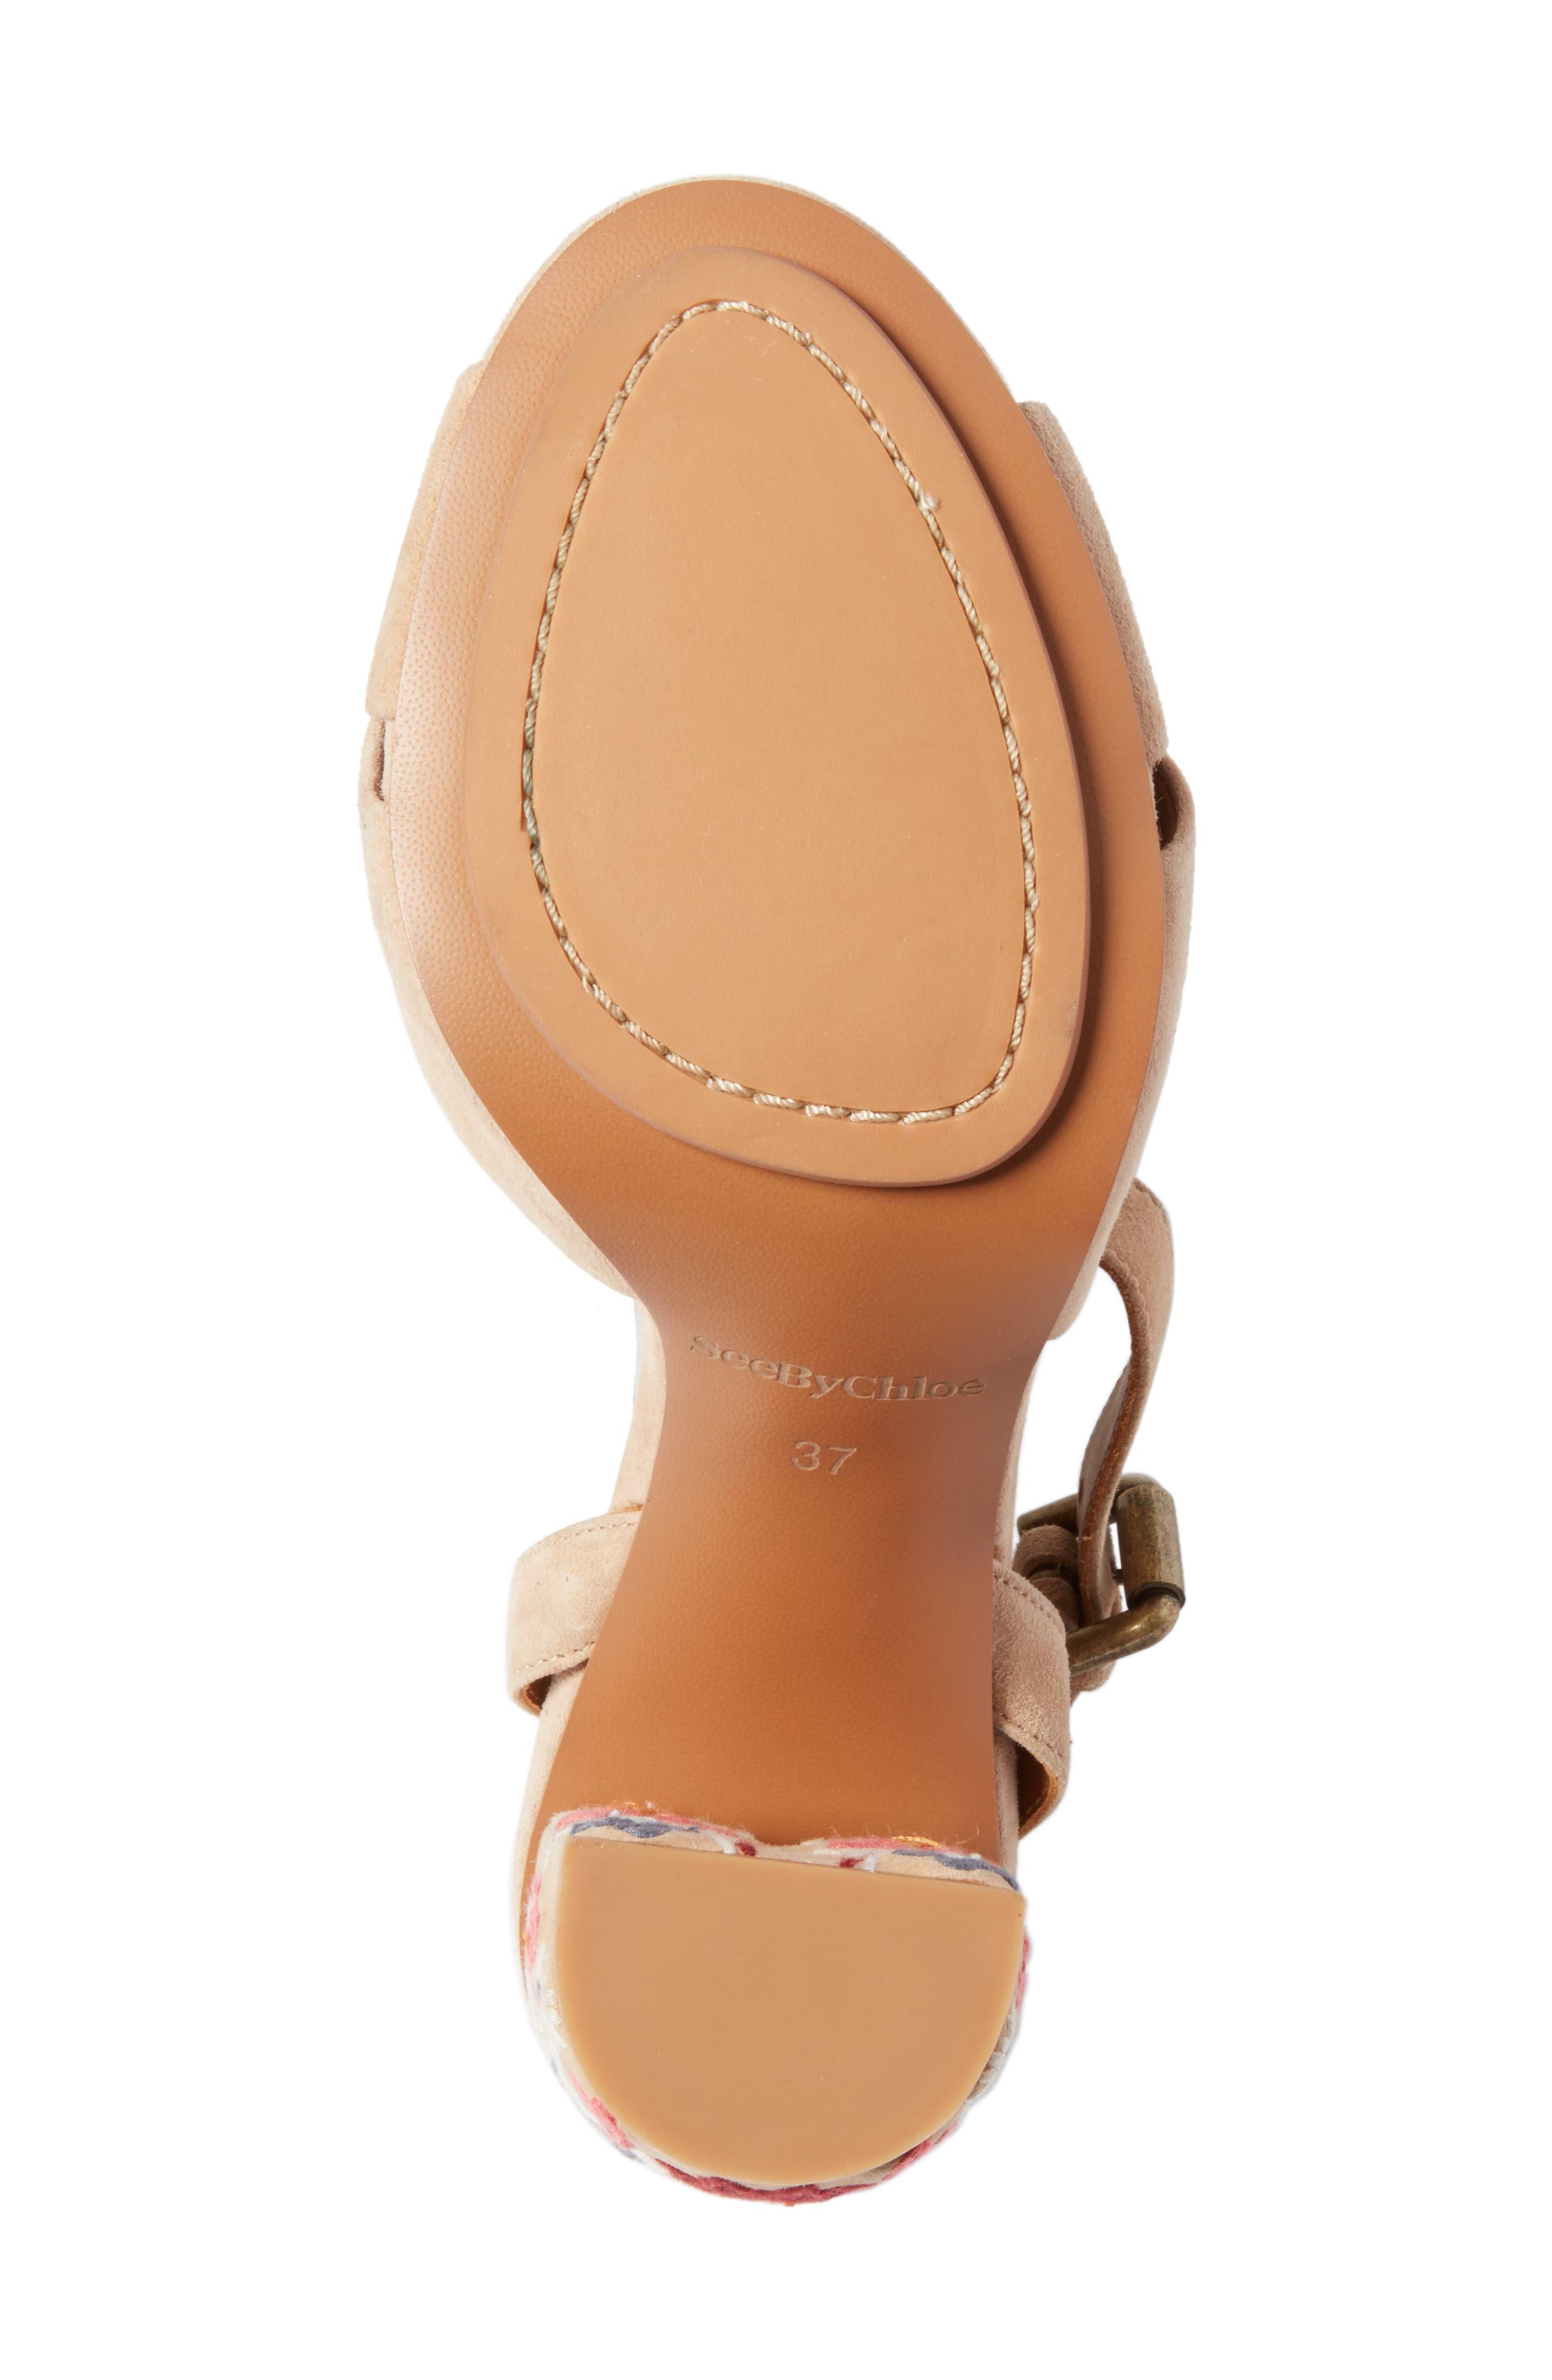 Gayla Embroidered Block Heel Sandal,                             Alternate thumbnail 6, color,                             250